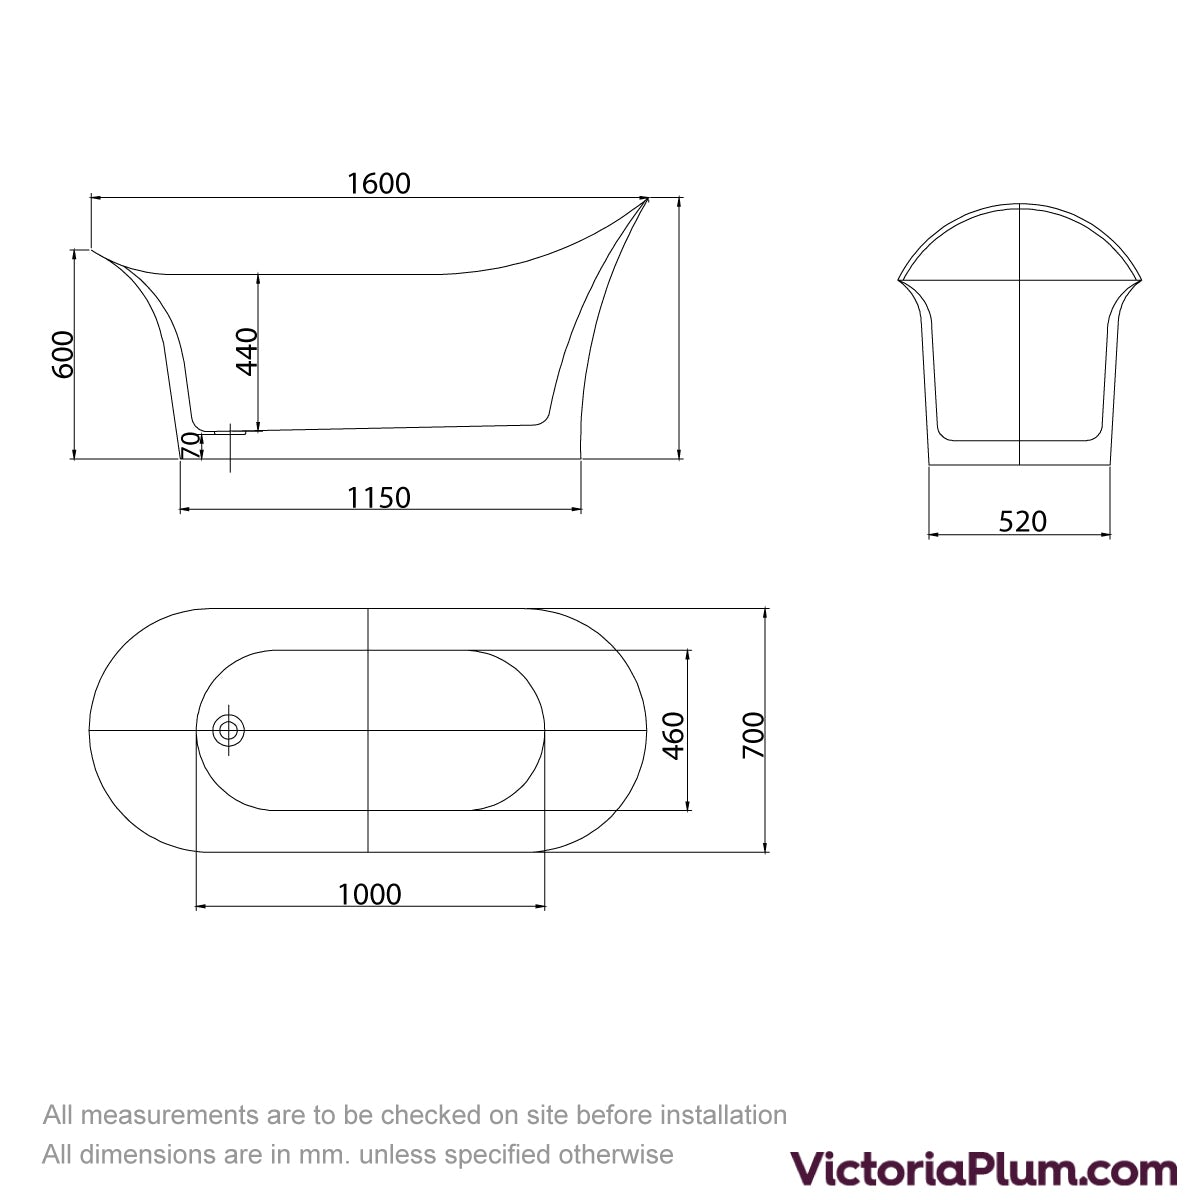 Dimensions for Mode Heath freestanding bath 1600 x 700